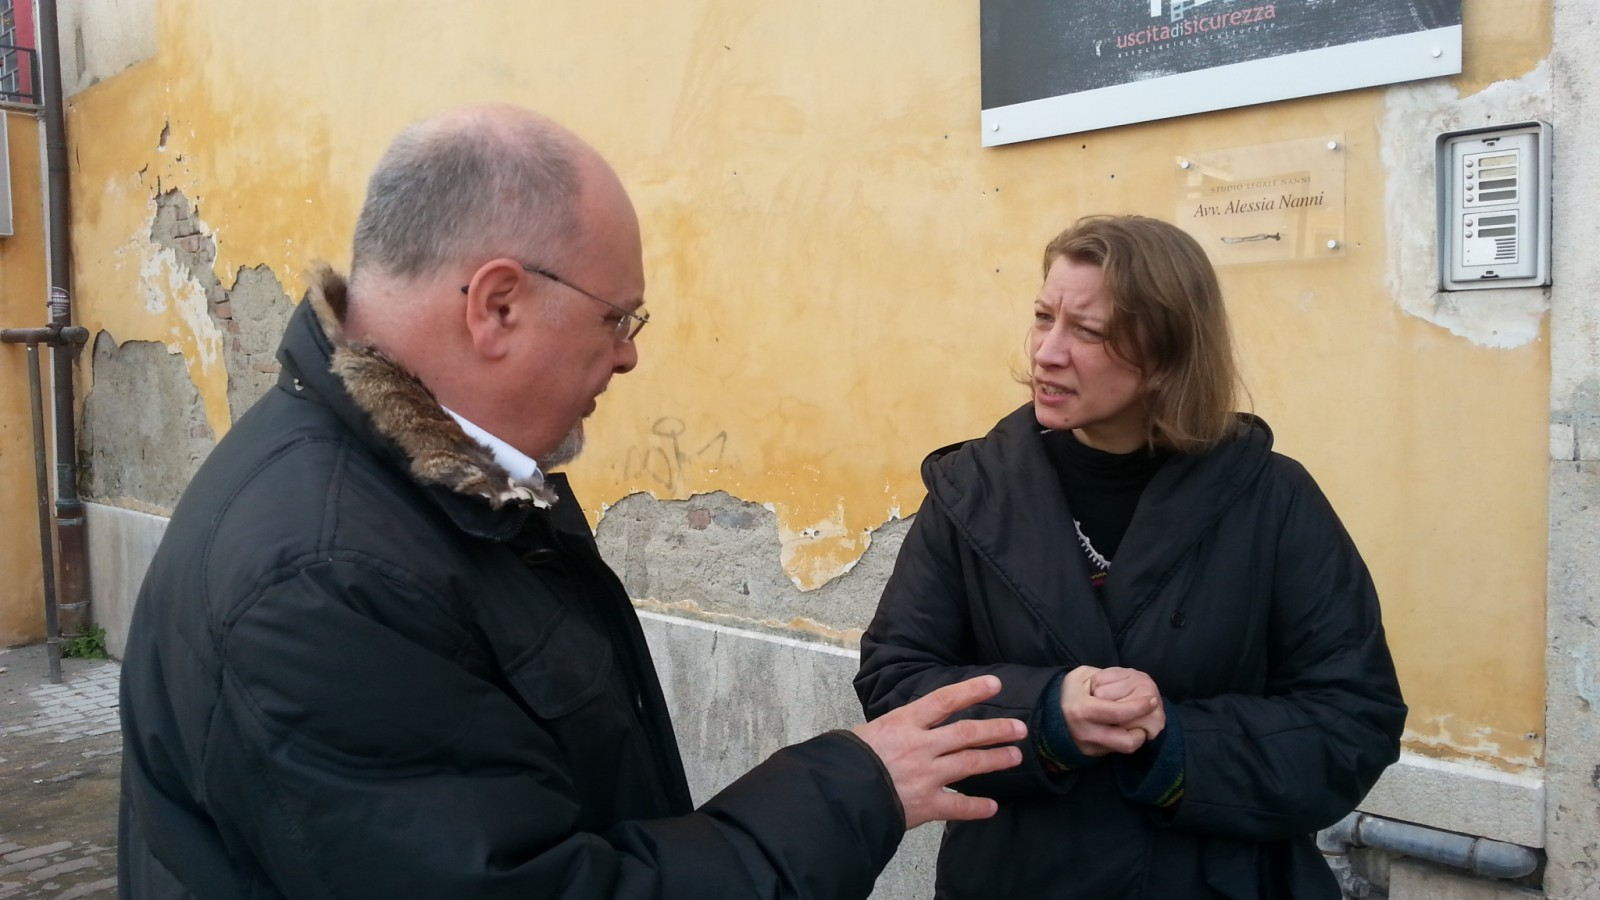 Marianna Farese, identikit del candidato 5 Stelle